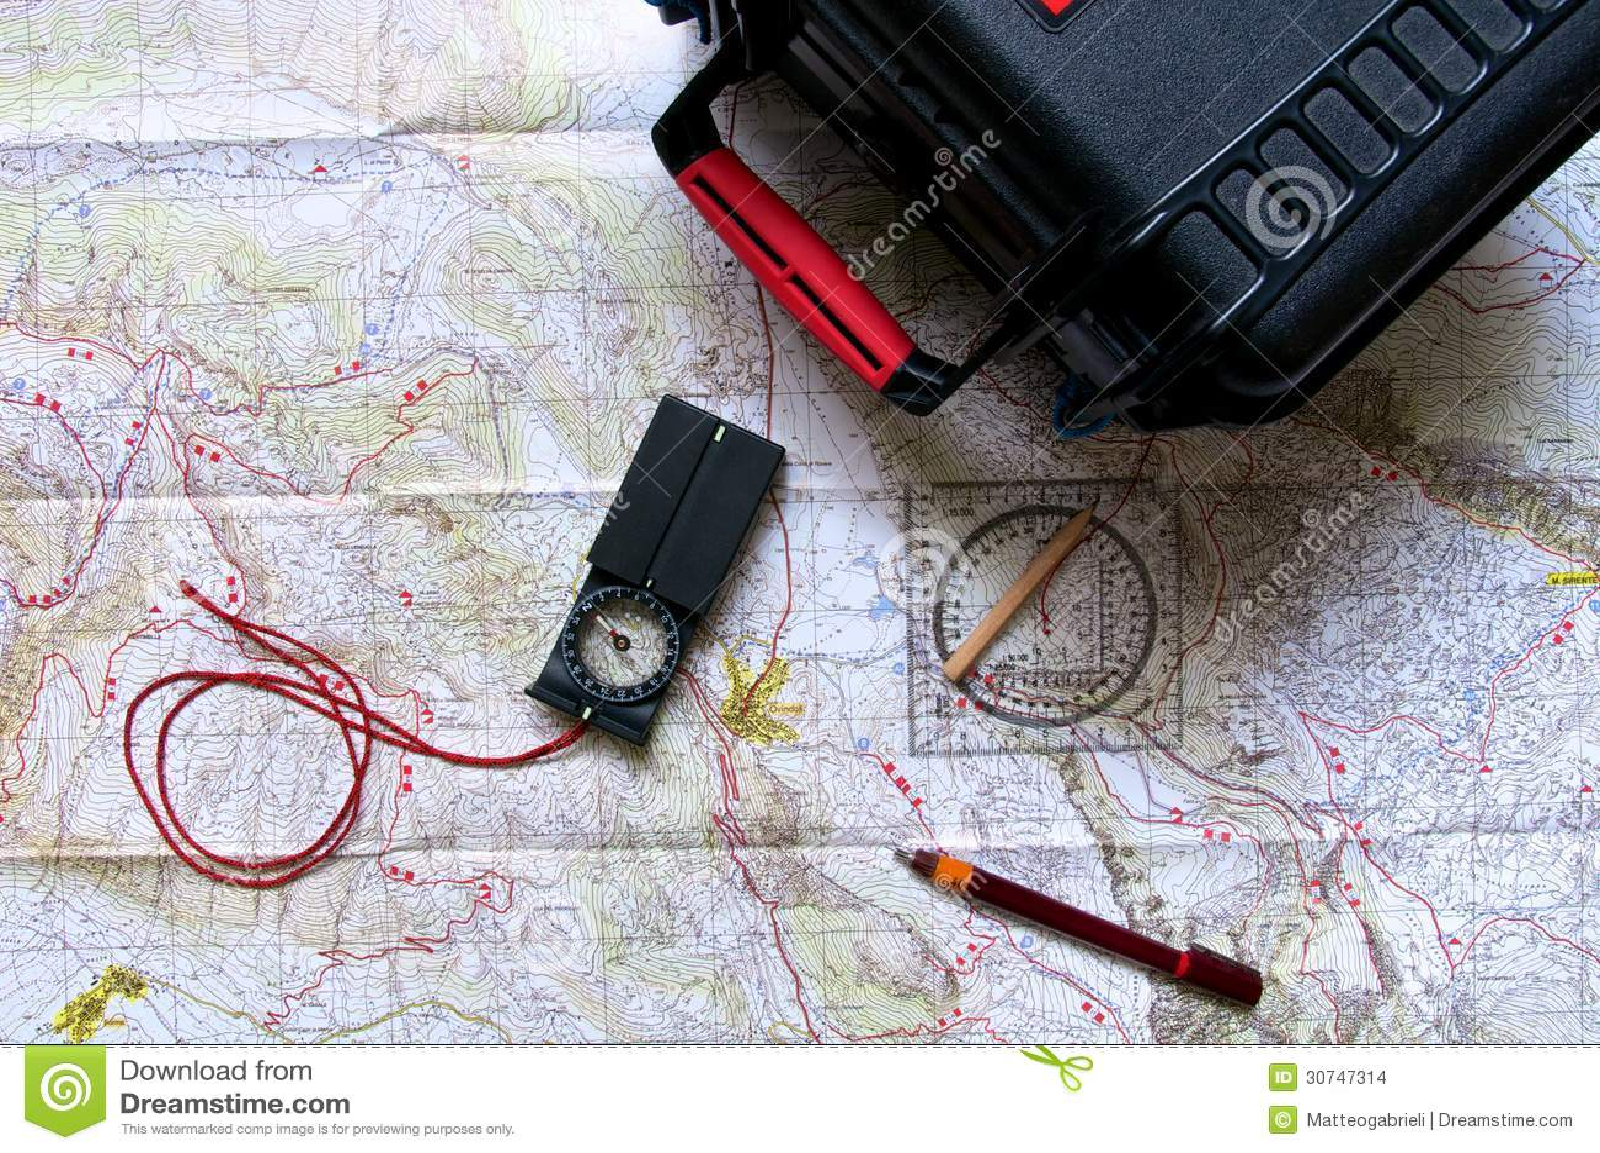 Travel equipment stock photo. Image of direction, nature - 30747314